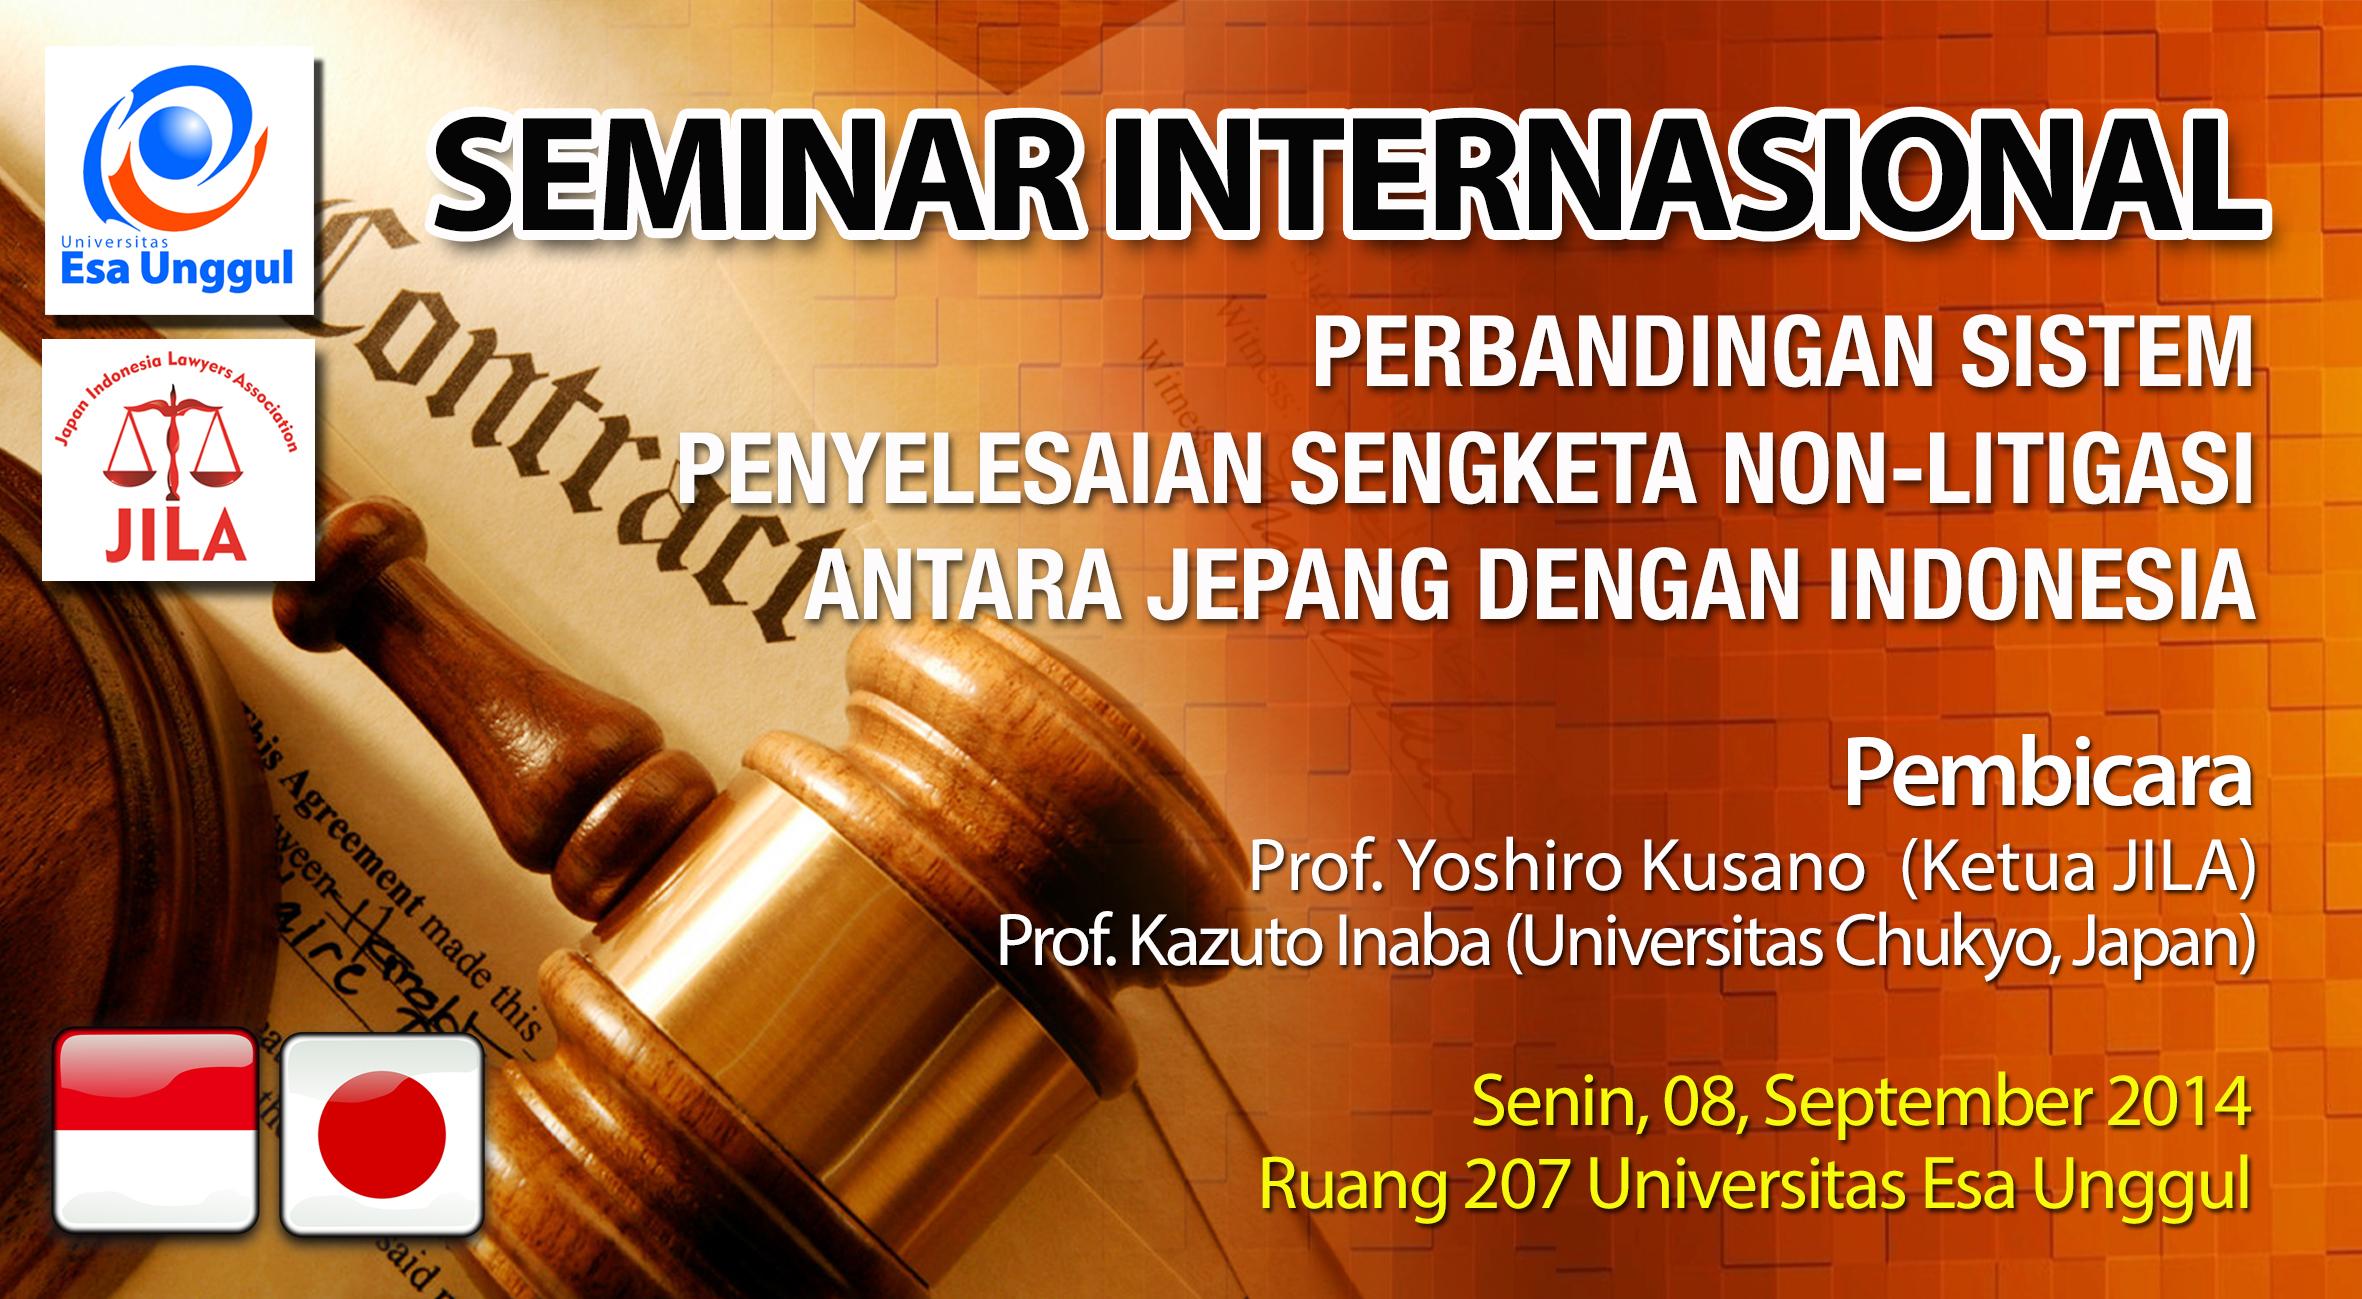 "Universitas Esa Unggul bekerjasama dengan Japan Indonesia Lawyers Association (JILA) menyelenggarakan Seminar Internasional "" Perbandingan Sistem Penyelesaian Sengketa Non-Litigasi antara Jepang dengan Indonesia"""